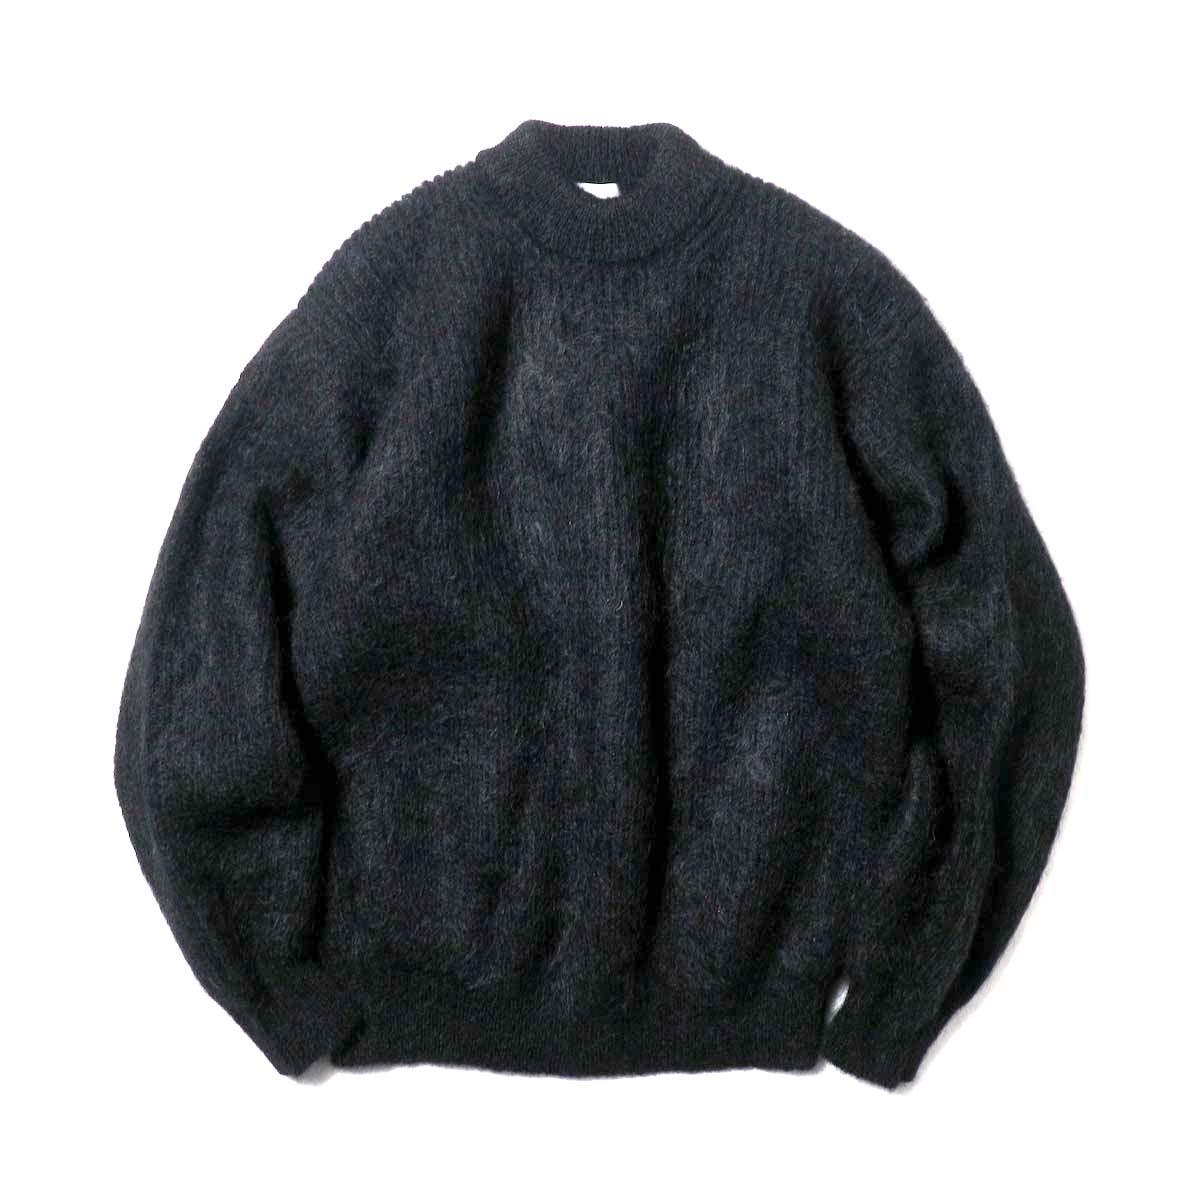 blurhms / Kid Mohair Alpaca Wool Knit P/O (Black)